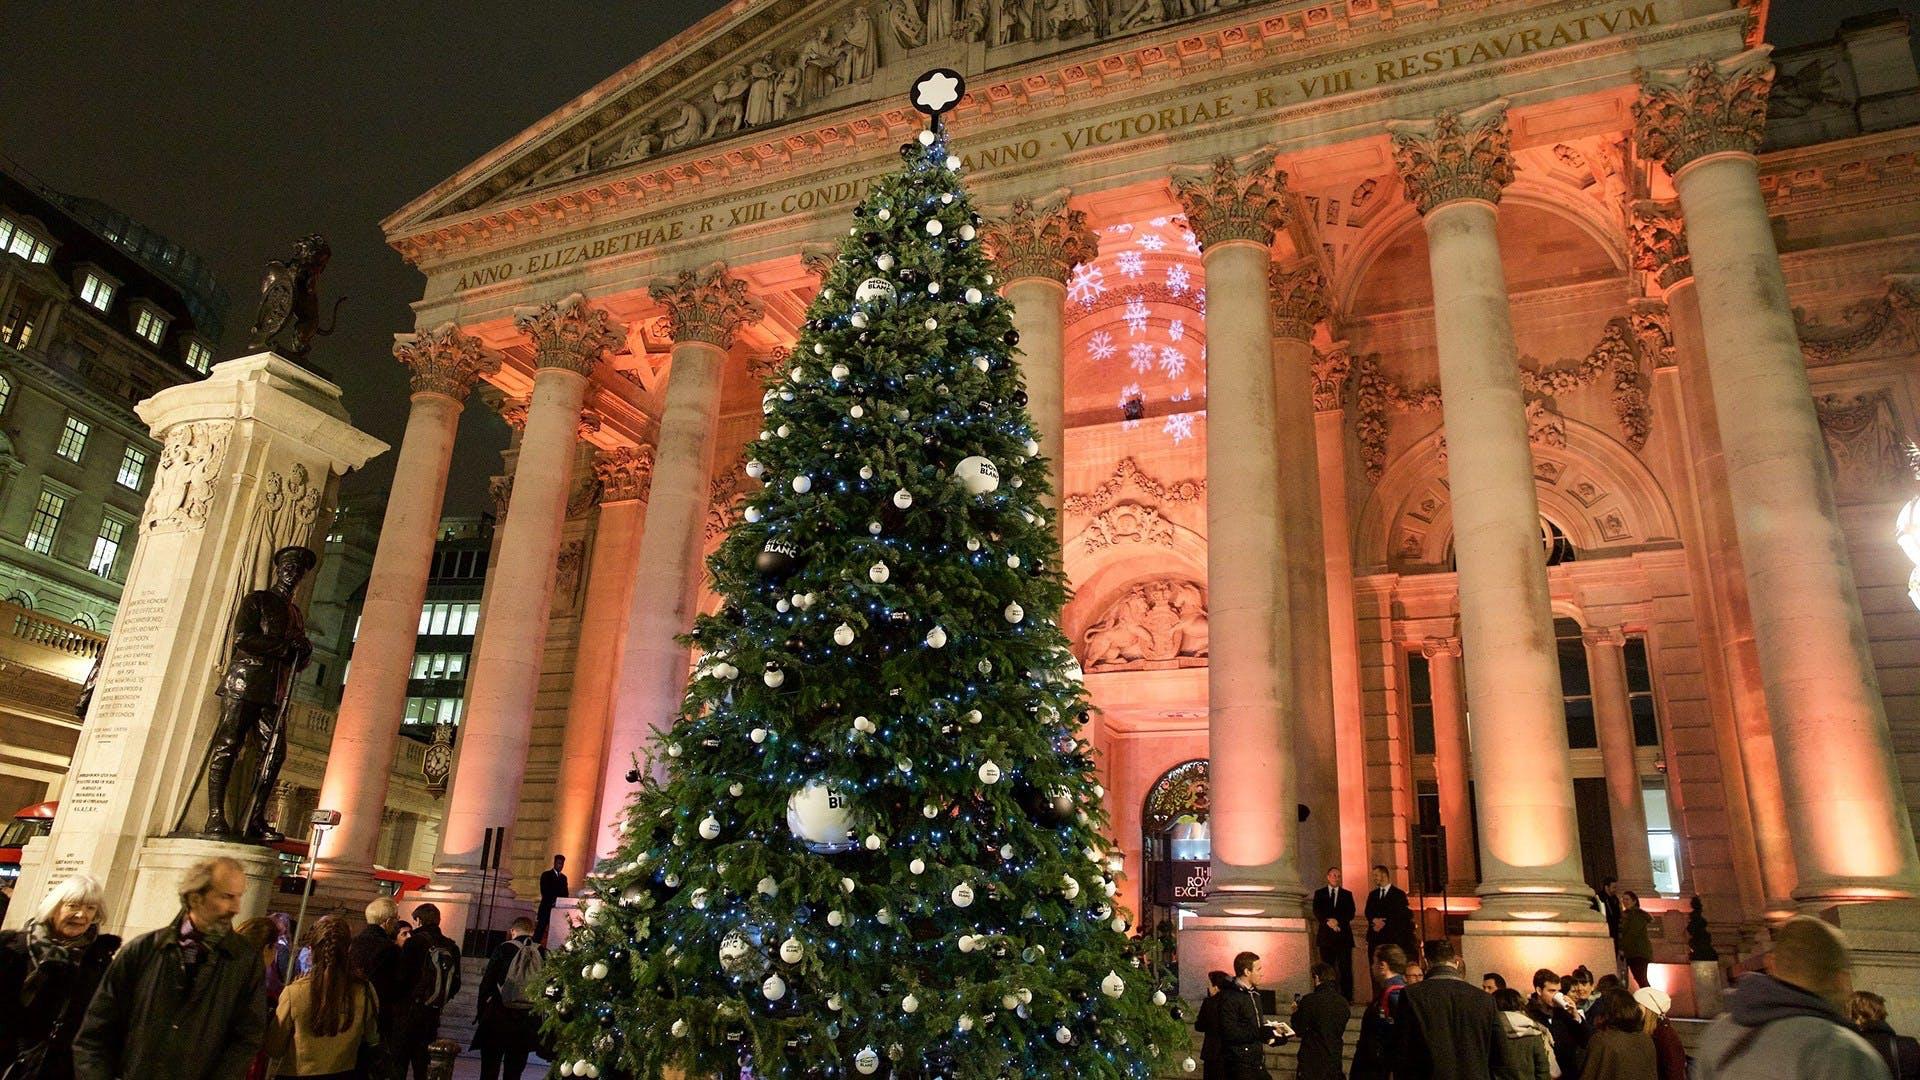 london jul england ferie shopping julemarked juletræ julelys